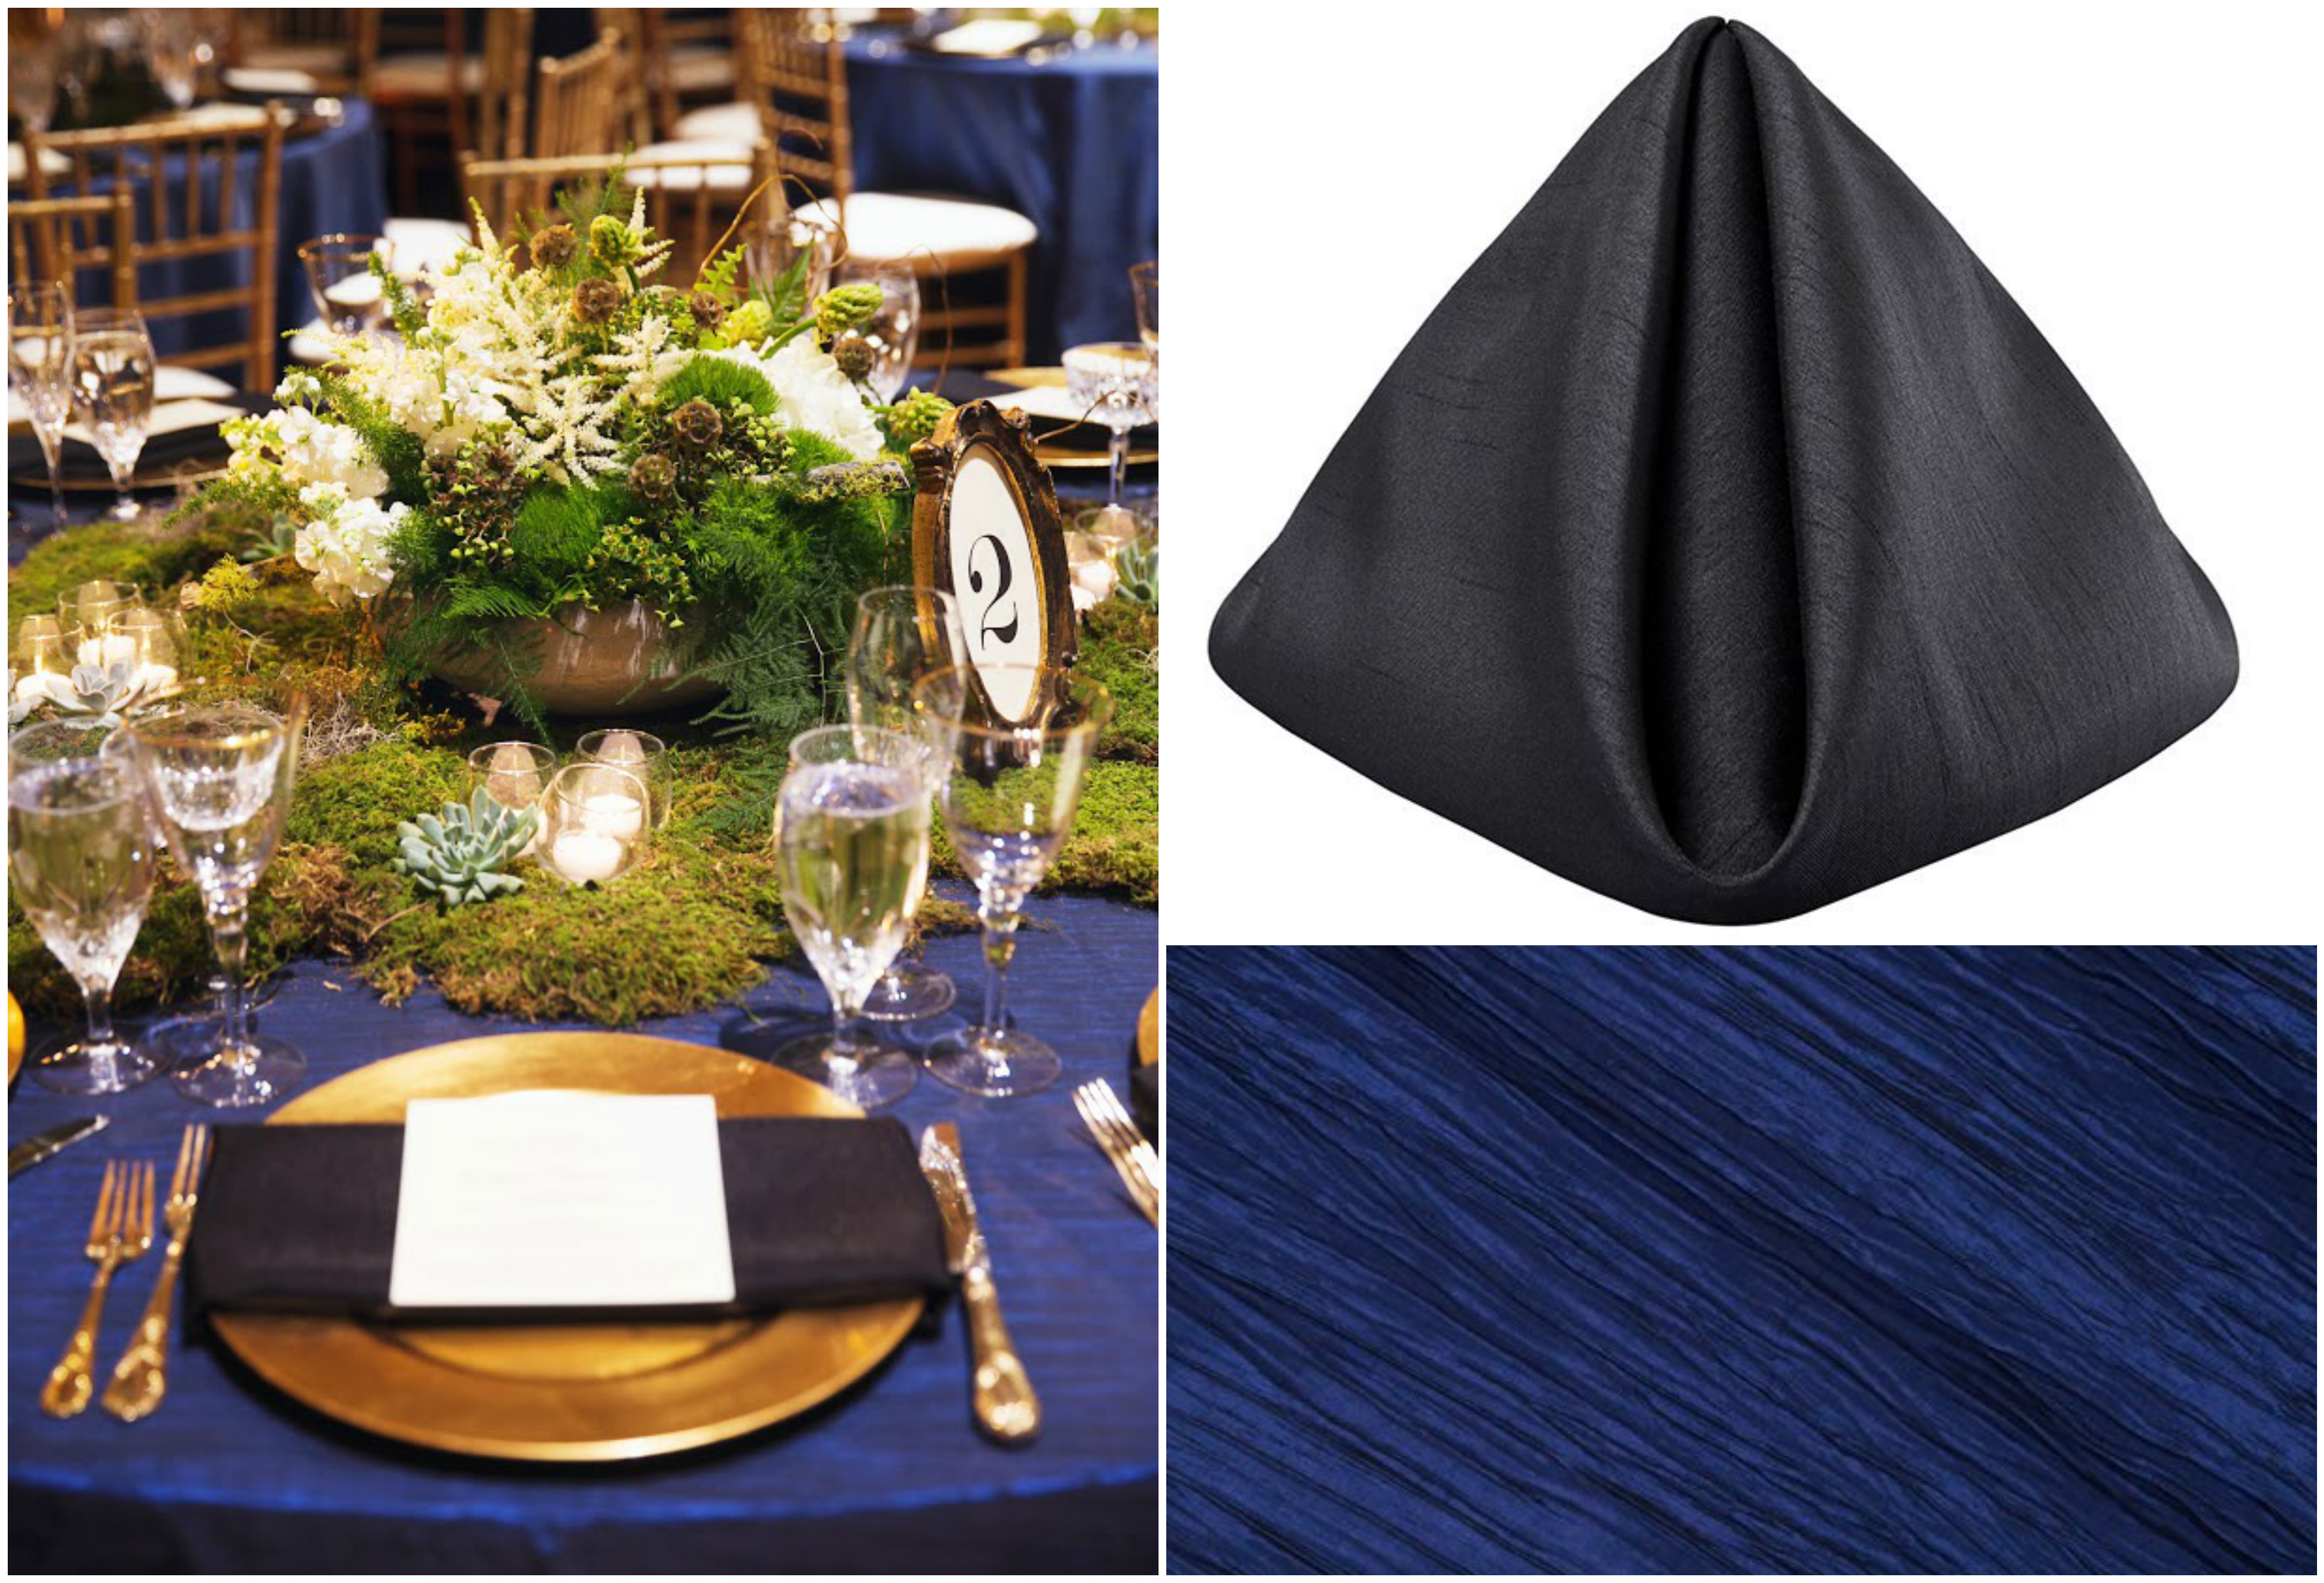 Black Shantung Napkin and Navy Blue Table Event Decor | BBJ Linen